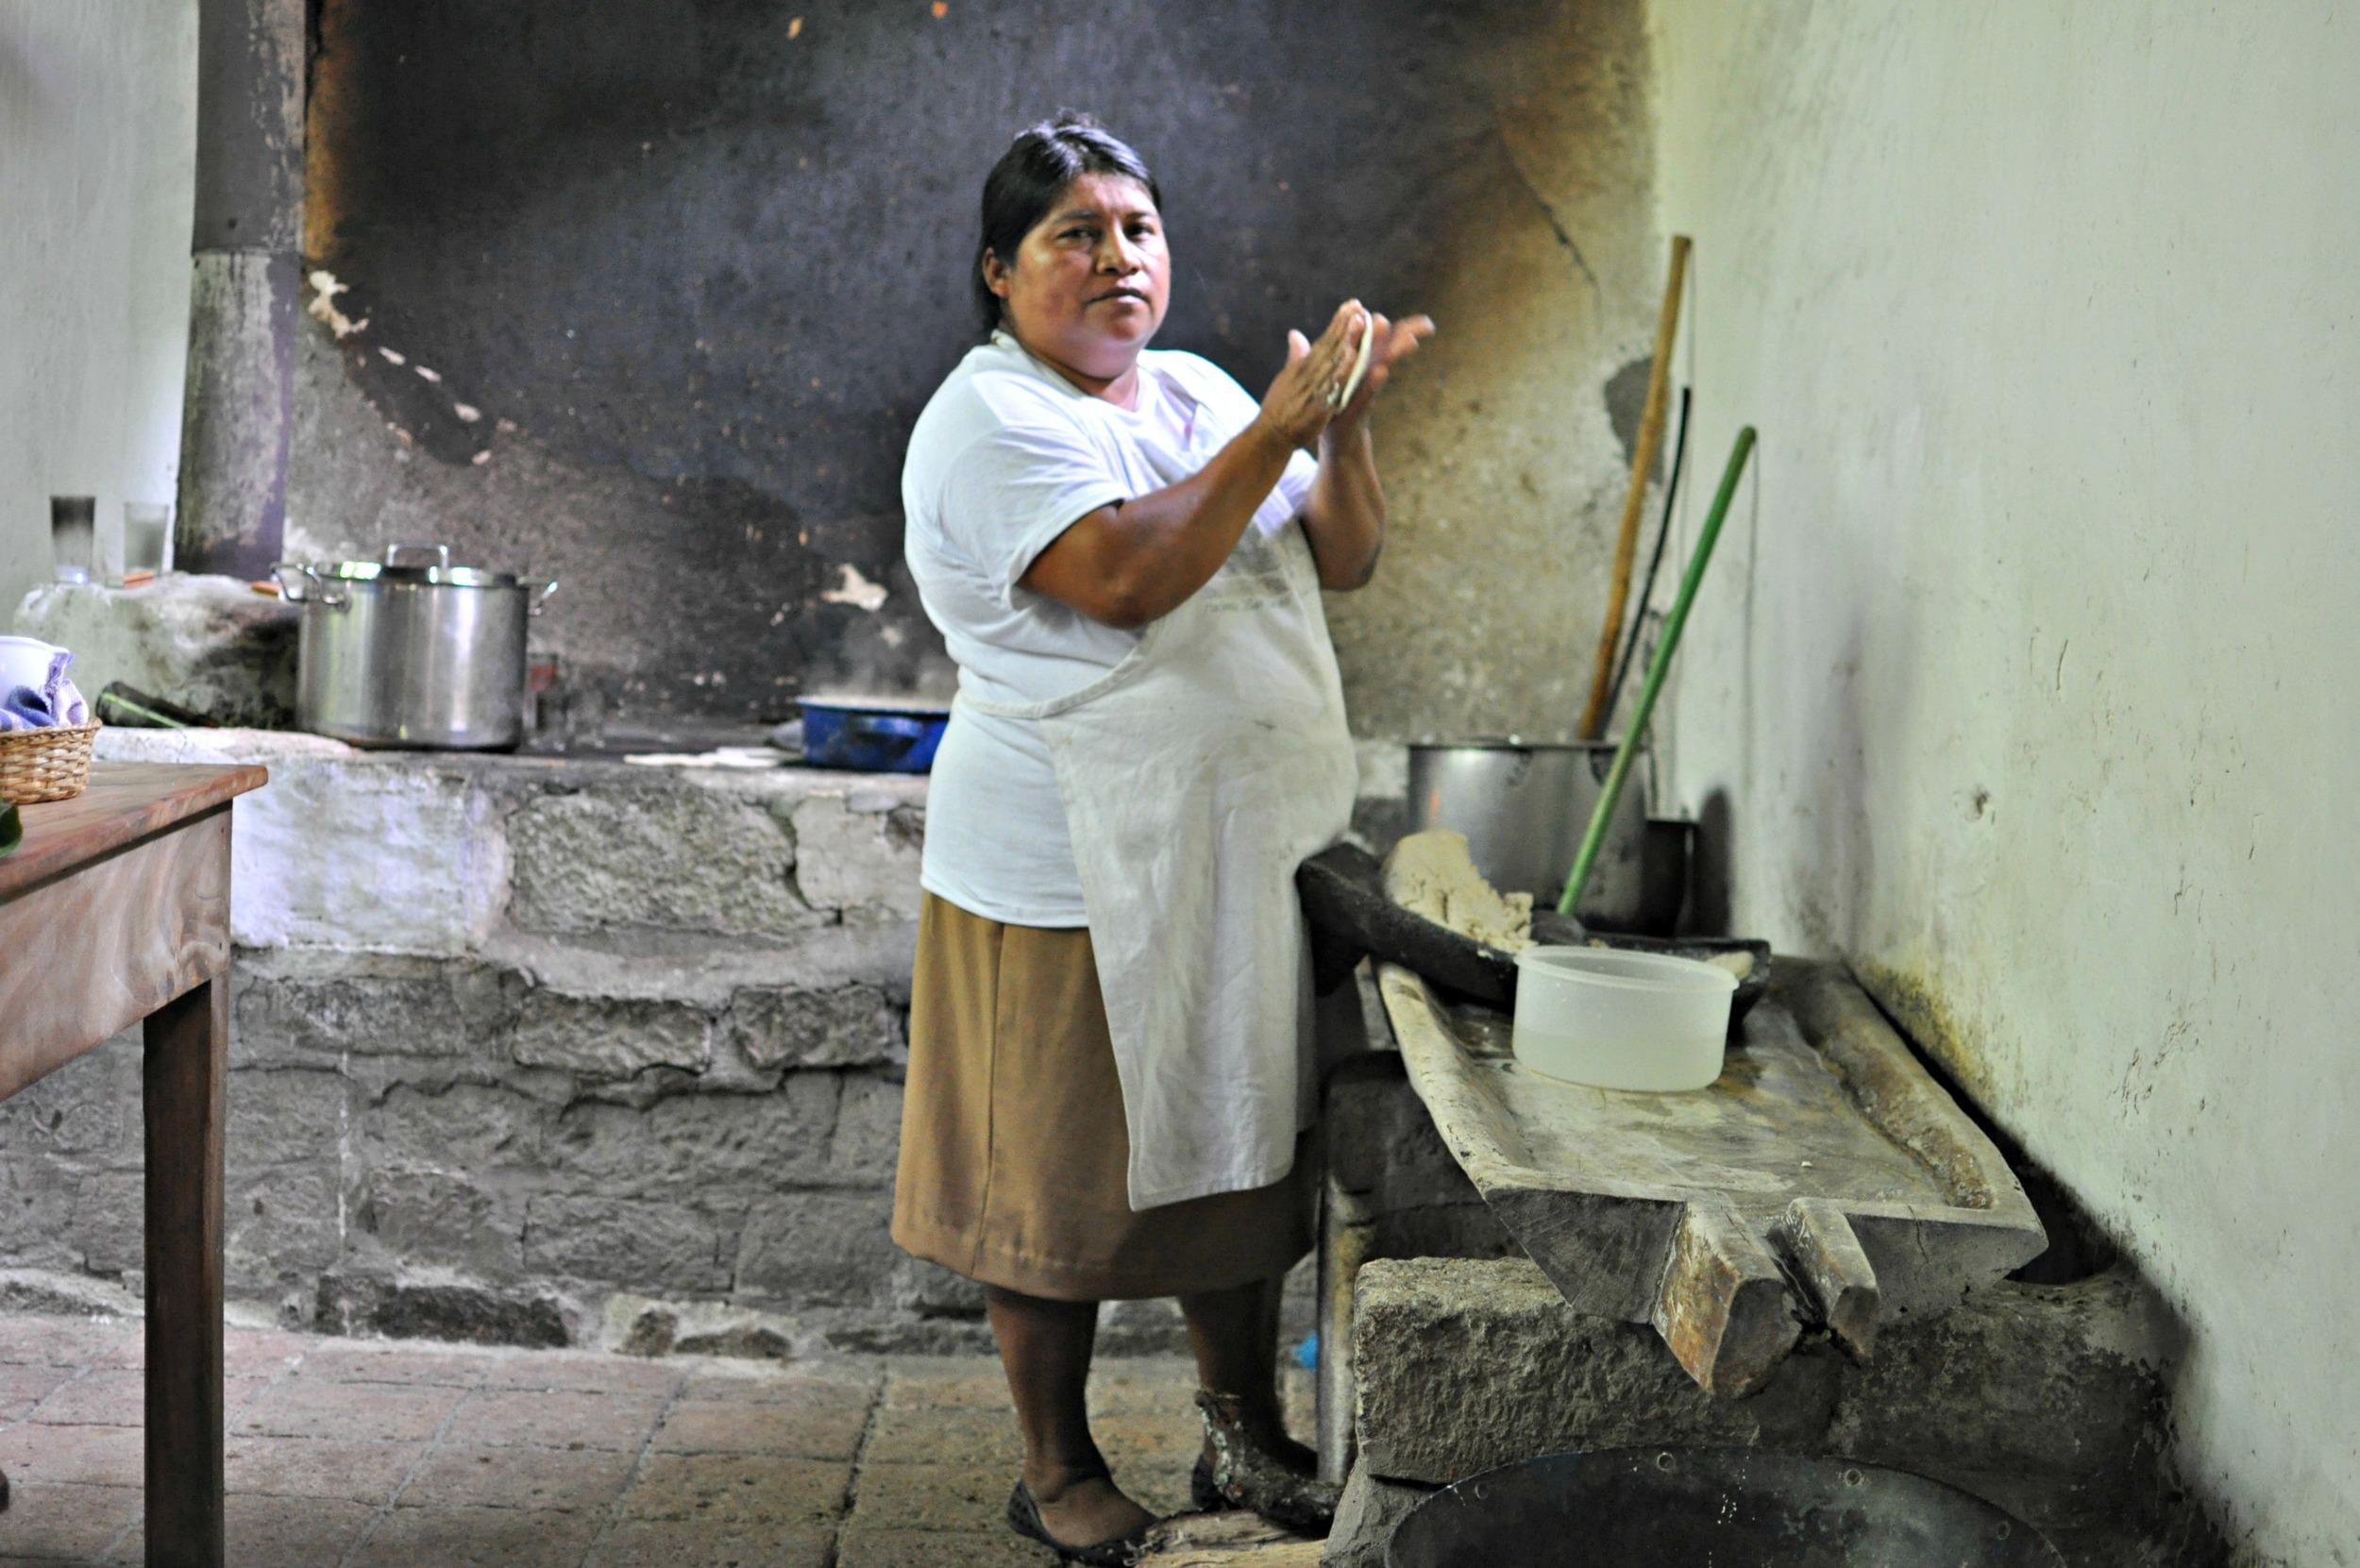 Making tortillas at Hacienda San Lucas